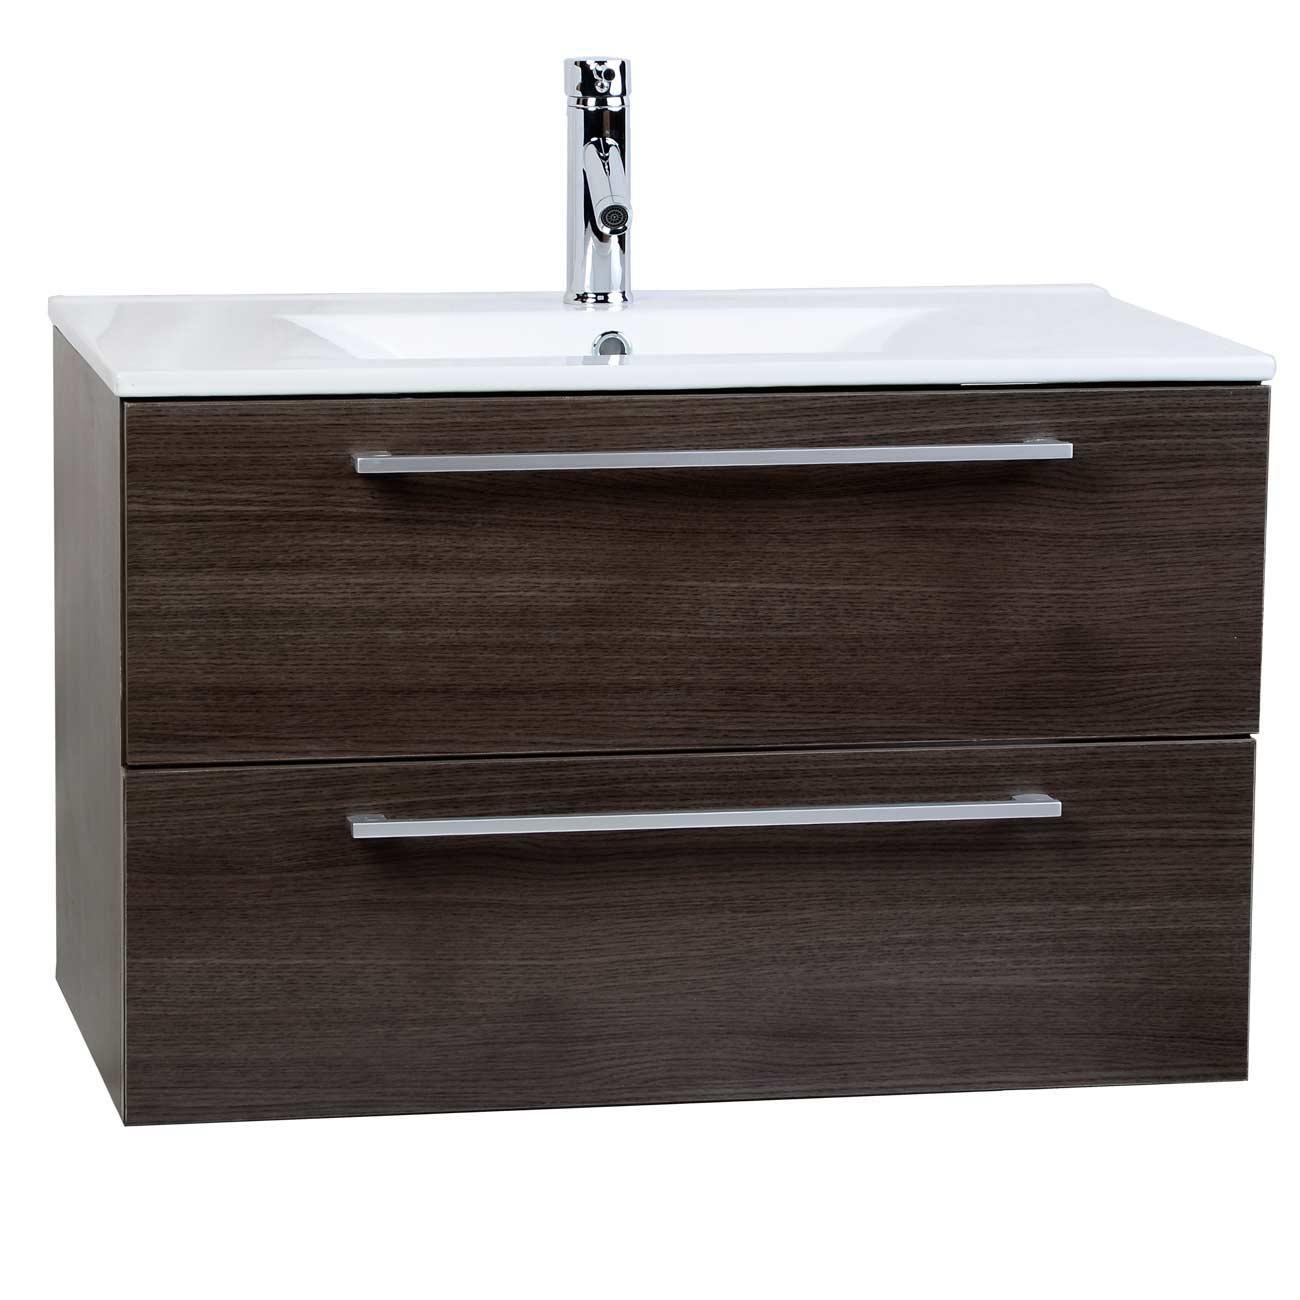 Buy Caen 32 Inch Wall Mount Modern Bathroom Vanity Set Alamo Oak Optional Mirror Rs Dm800 Ao On